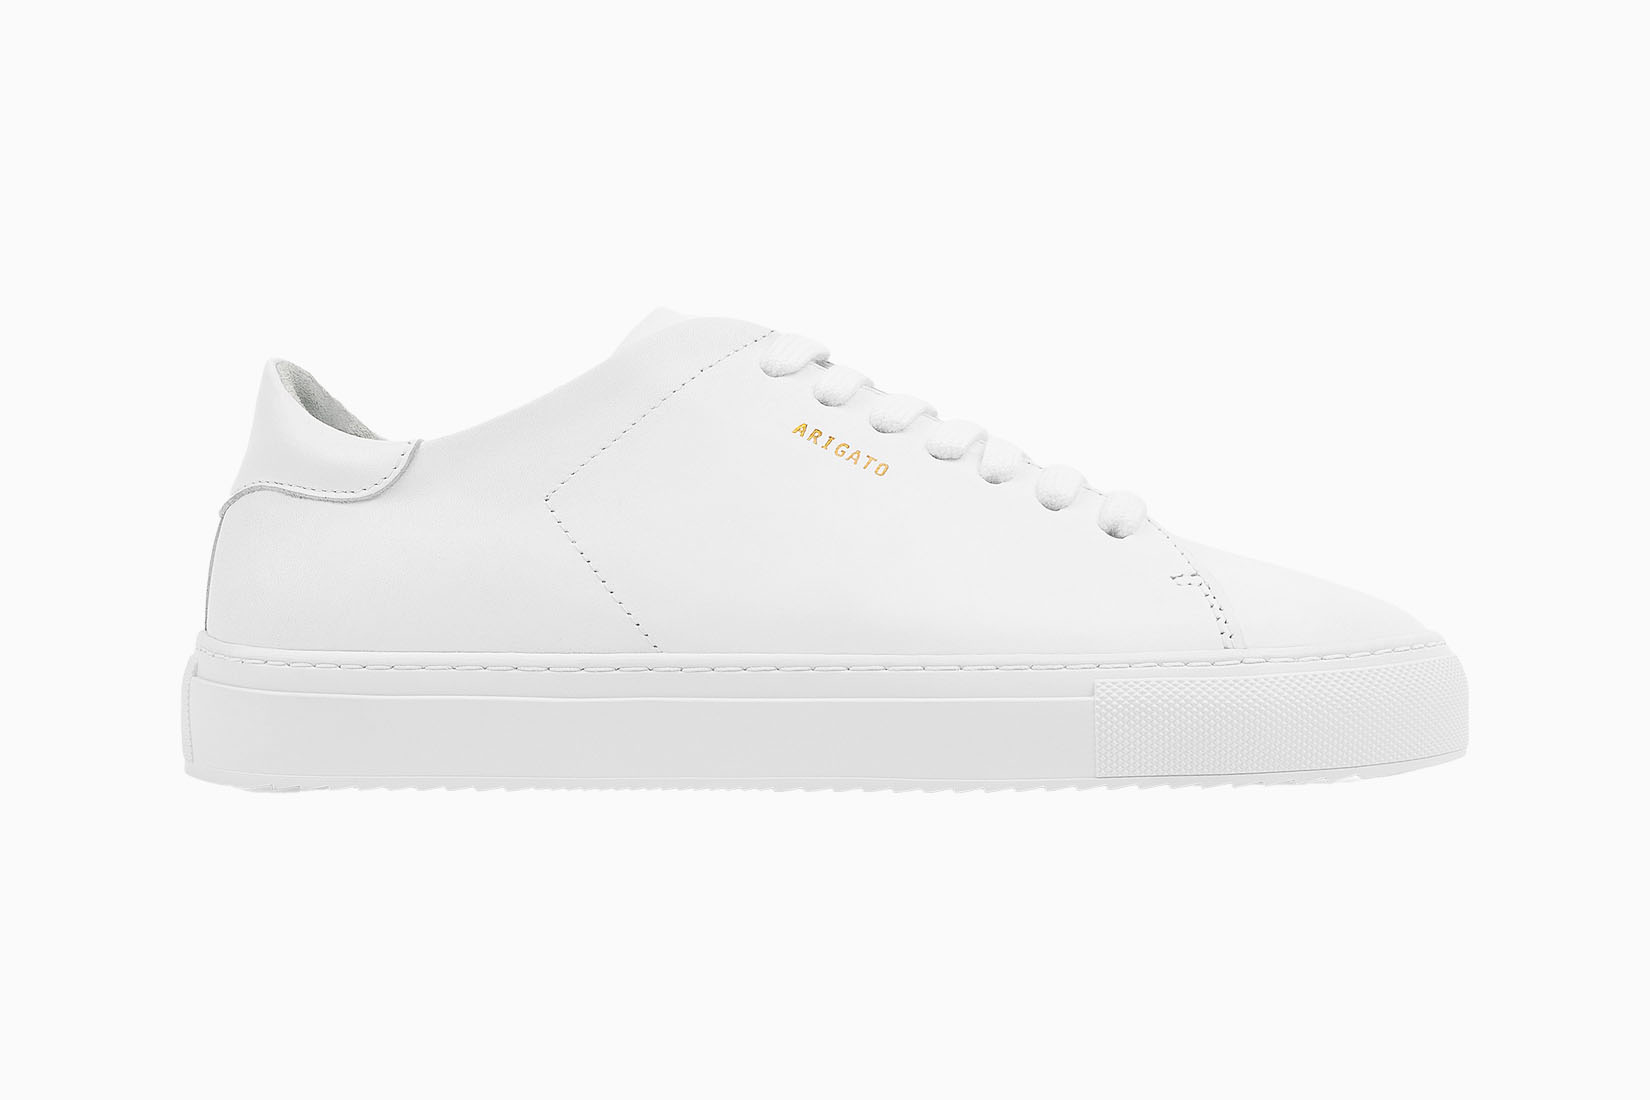 best sneakers women axel arigato clean 90 review Luxe Digital@2x